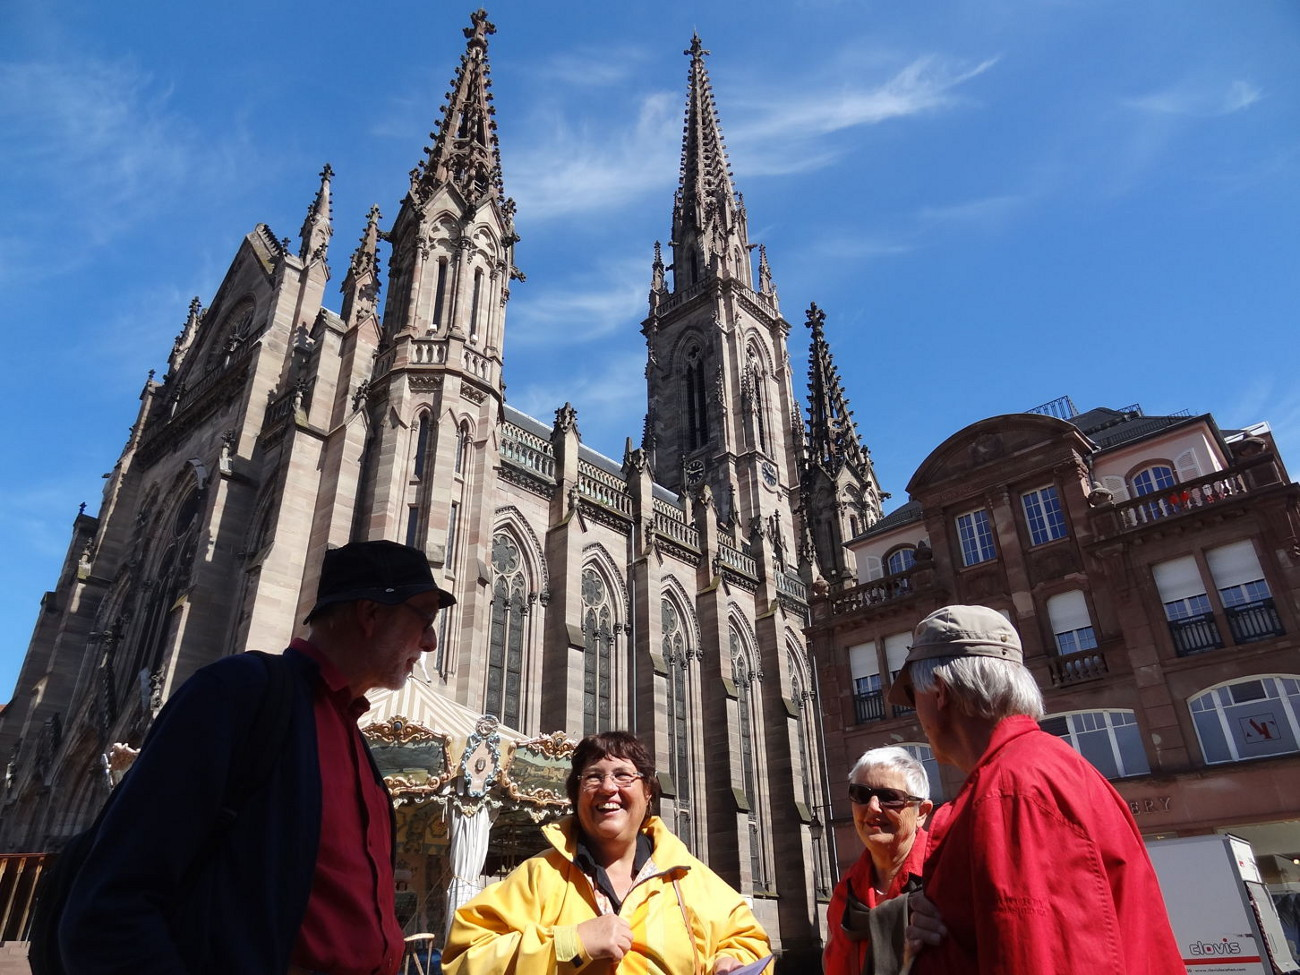 https://apps.tourisme-alsace.info/photos/mulhouse/photos/234009952_1.jpg